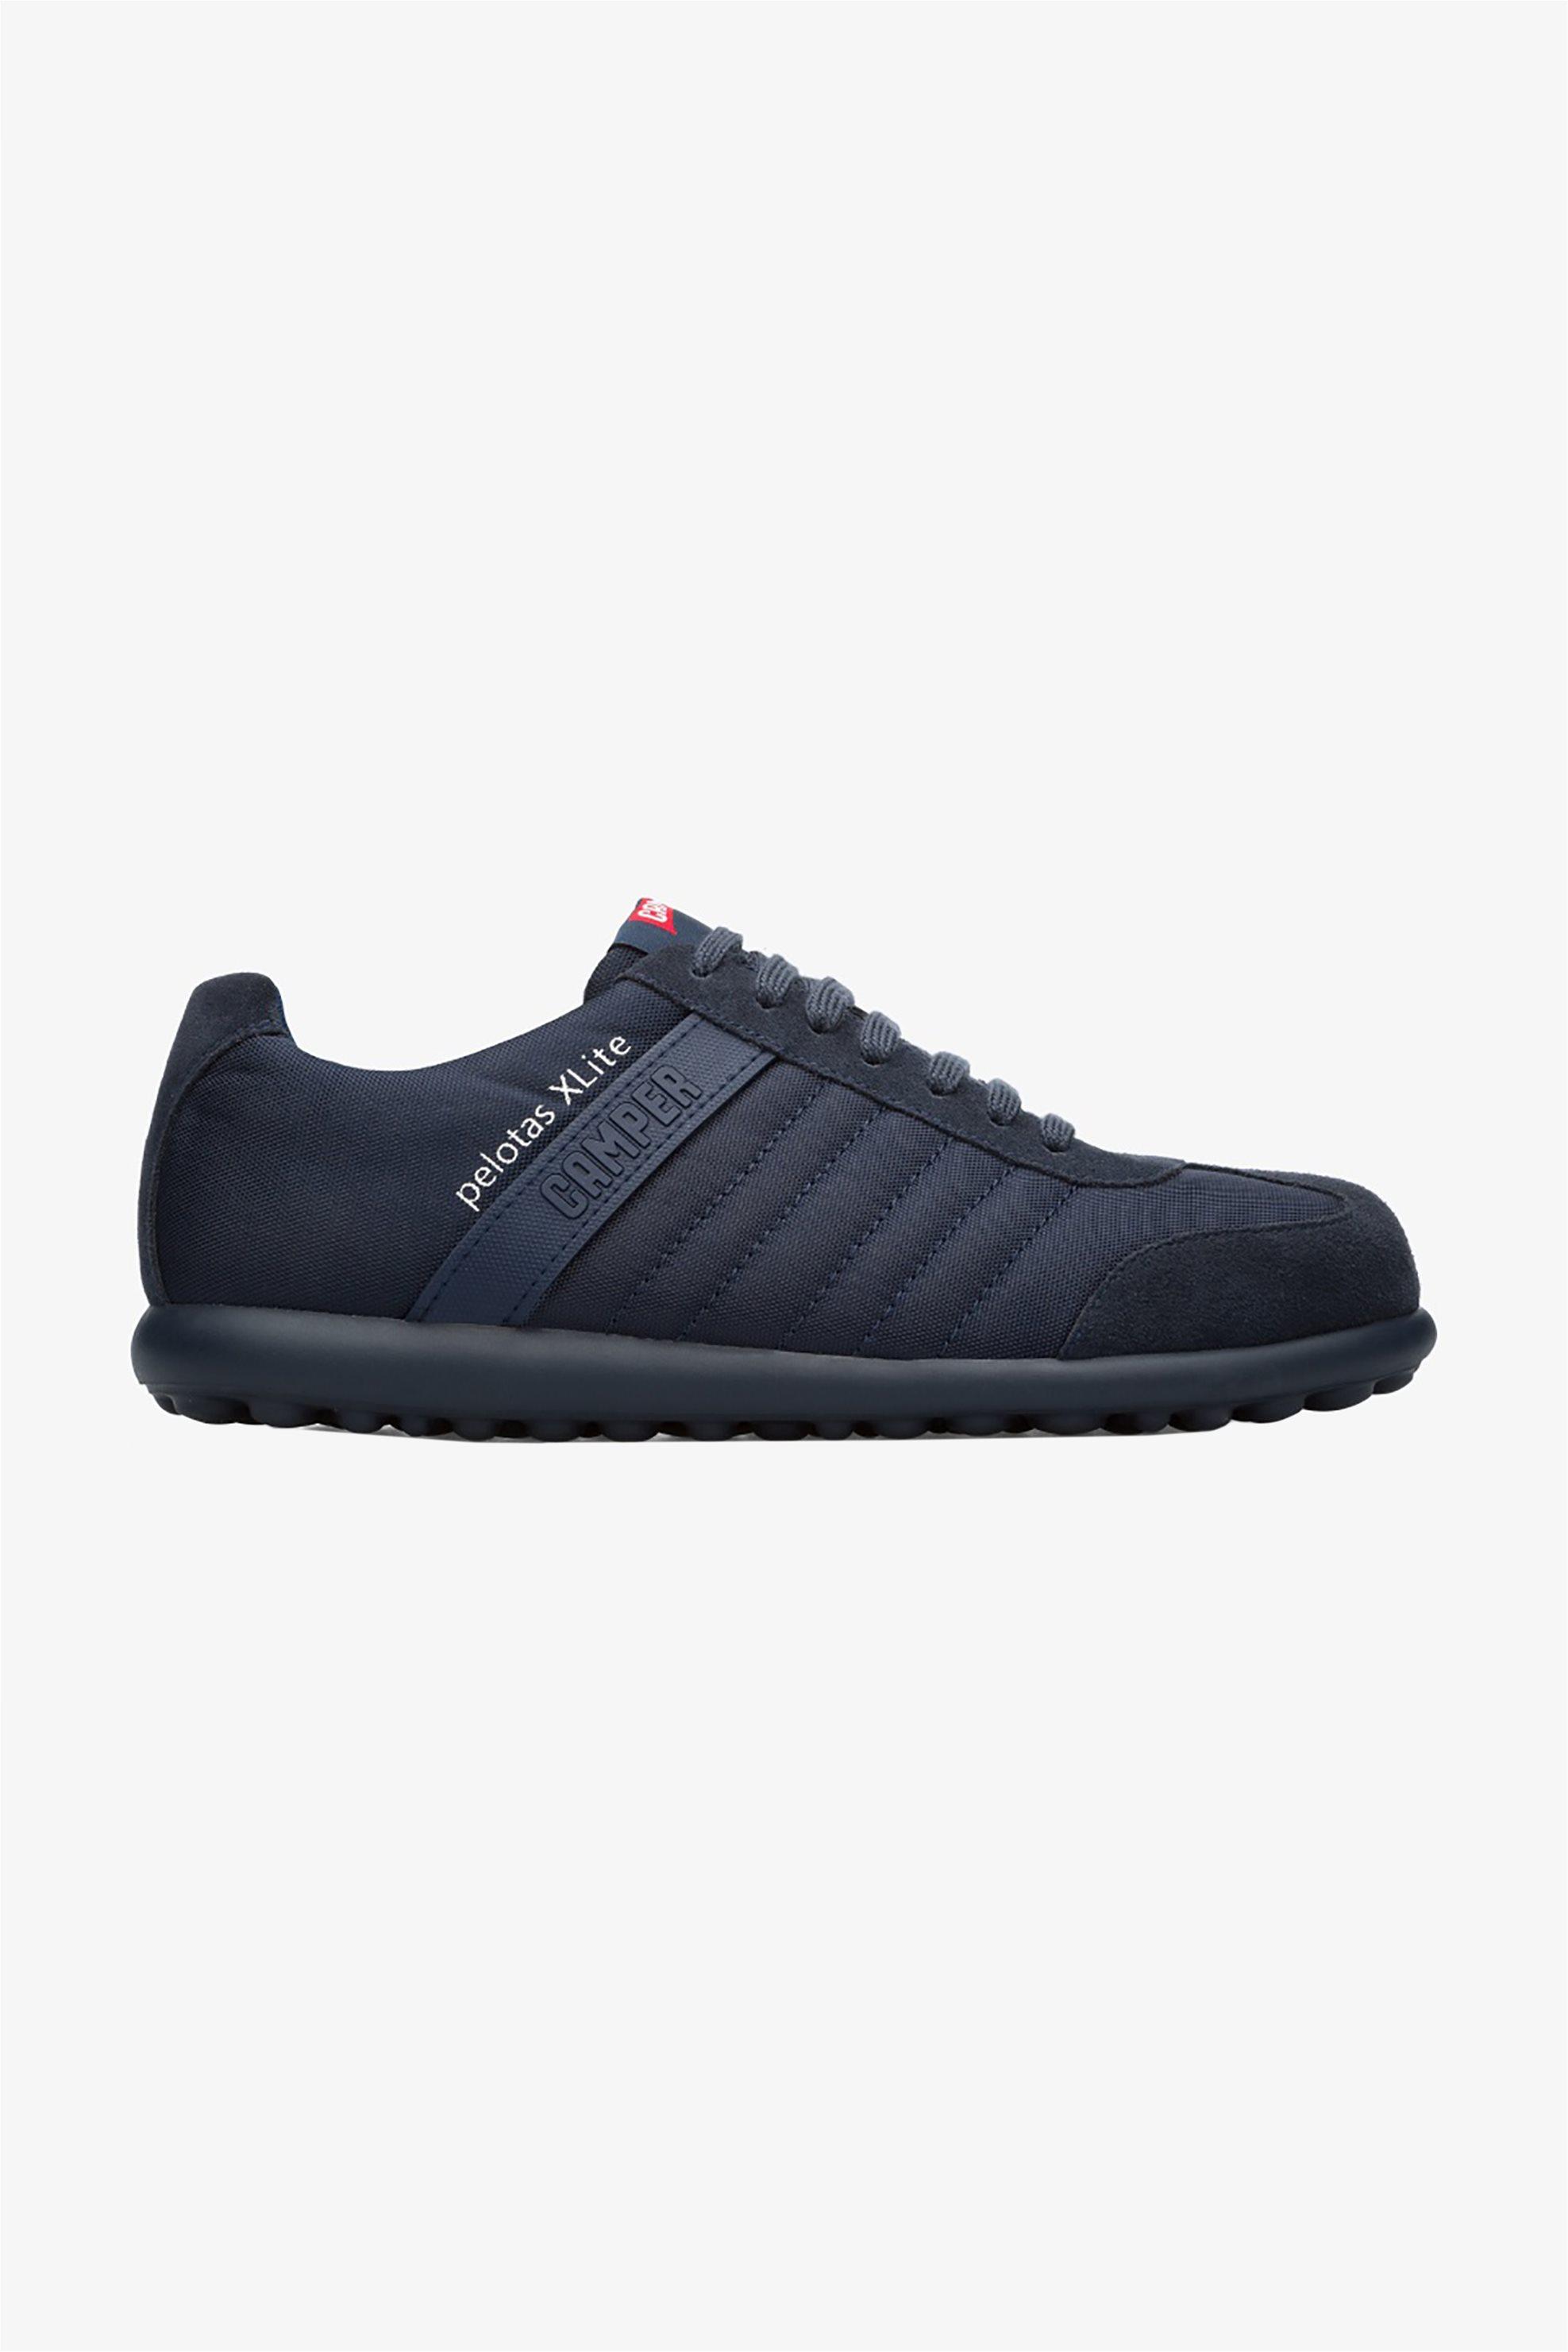 "Camper ανδρικά δερμάτινα sneakers ""Pelotas XLite"" – 18302-074 – Μπλε Σκούρο"